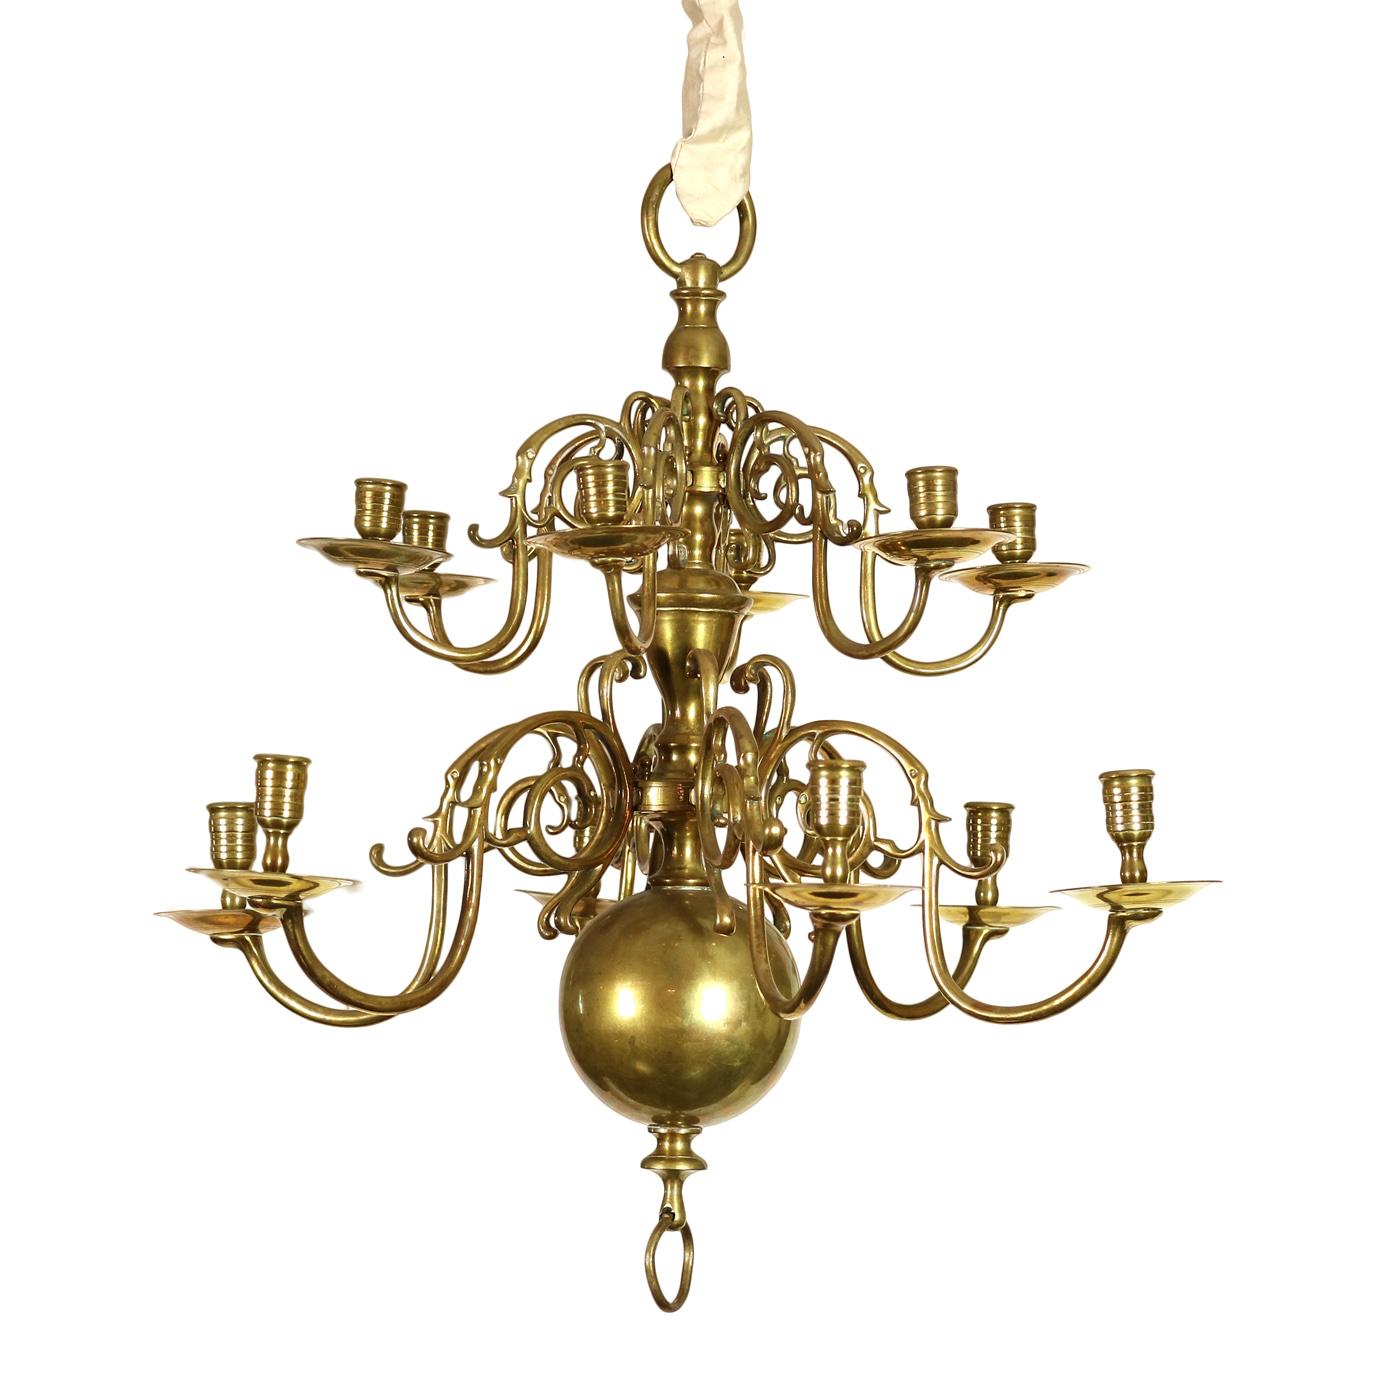 Small Scale 2-Tier, 12-Light Dutch Brass Chandelier Circa